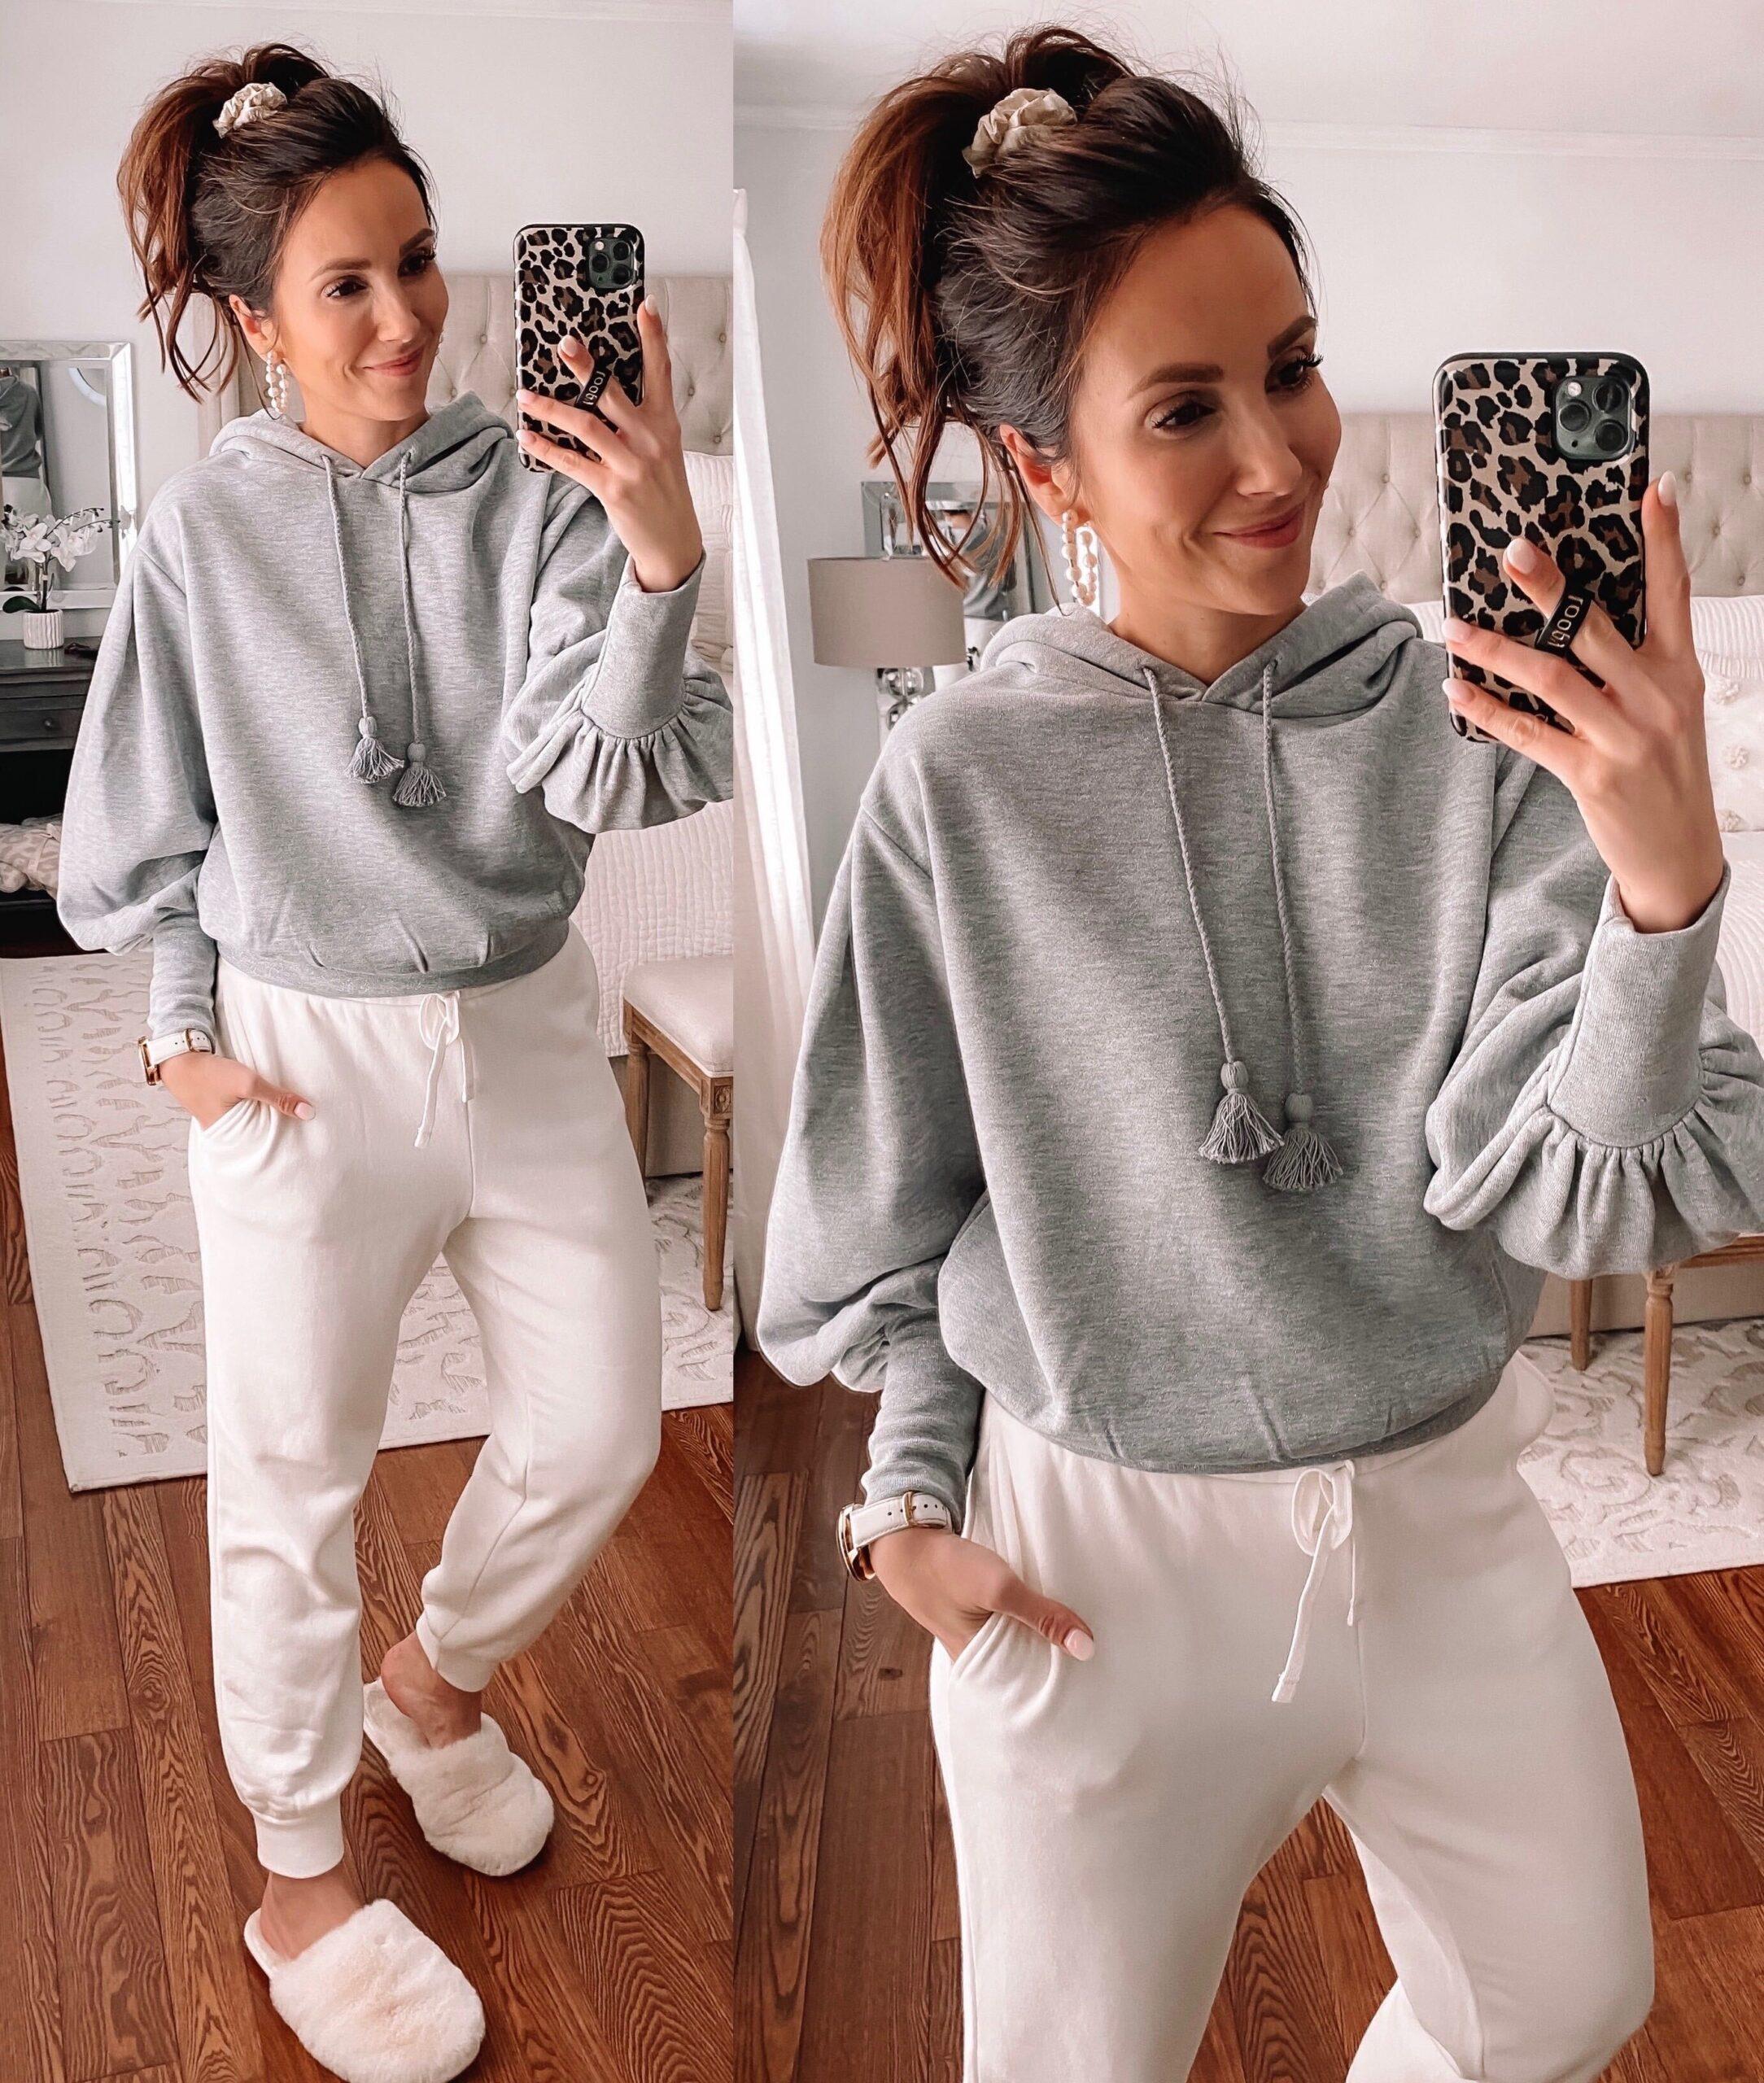 express grey sweatshirt, express loungewear